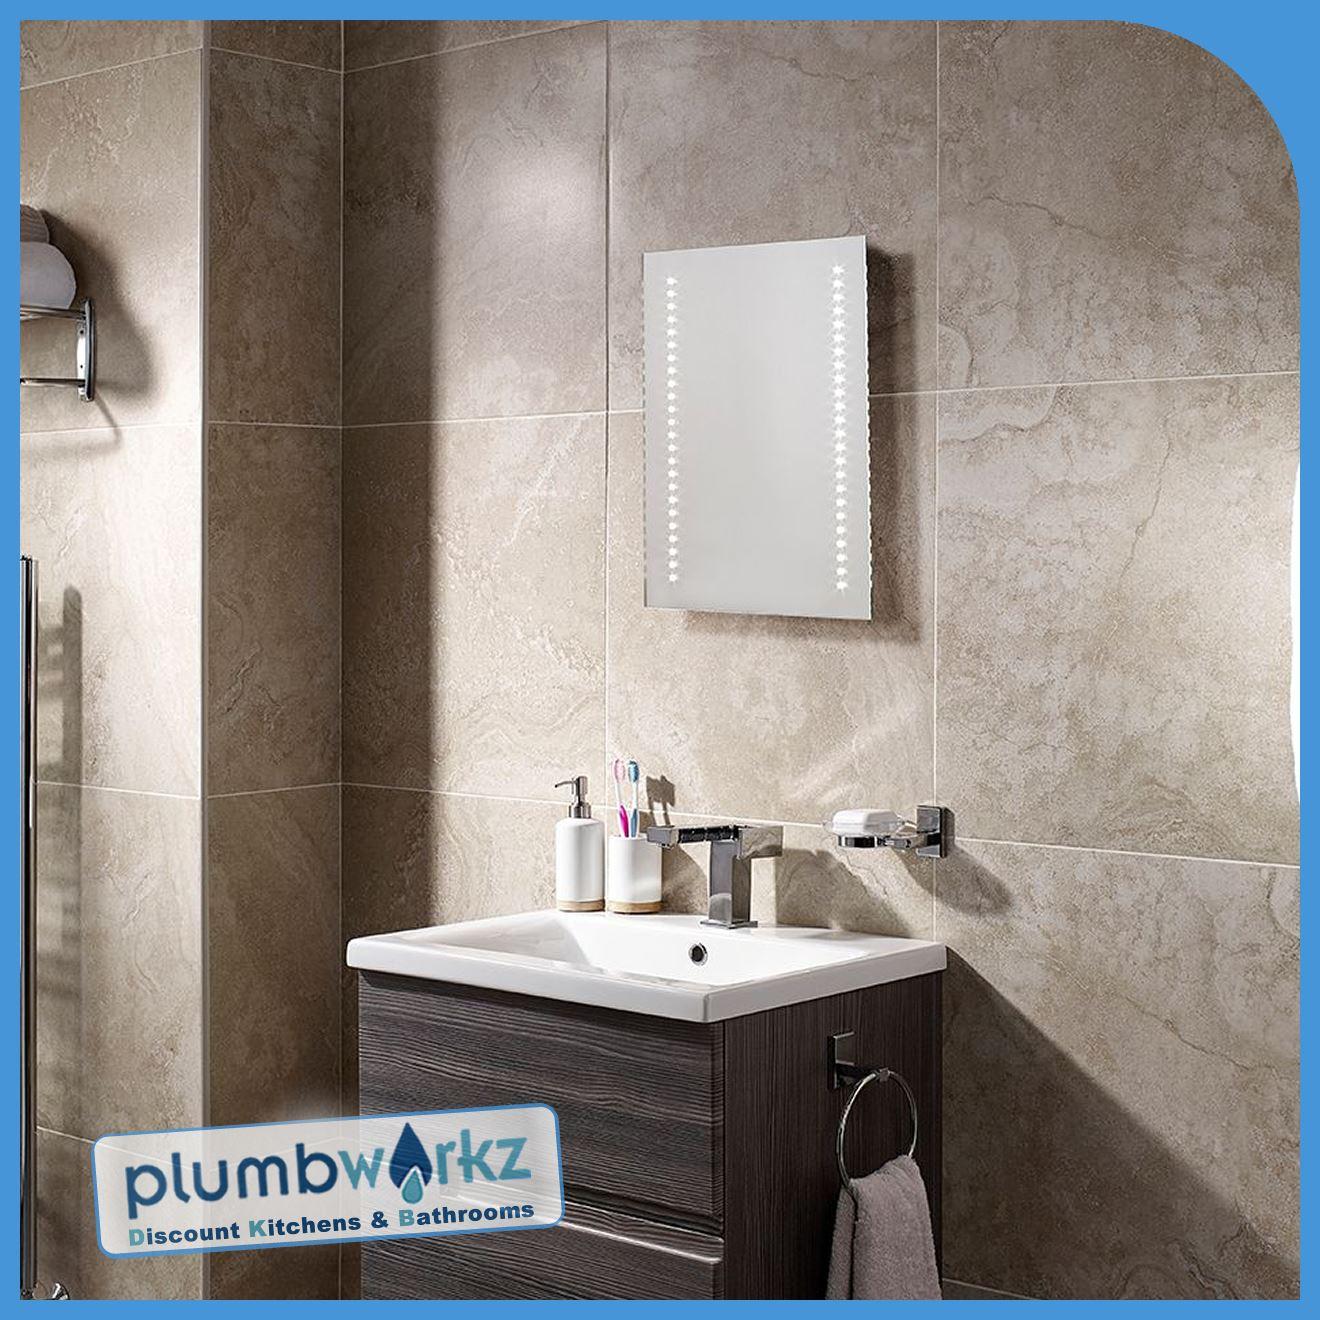 Lighted Mirrors For Bathrooms Modern: Modern Led Illuminated Bathroom Mirror Bluetooth Demister